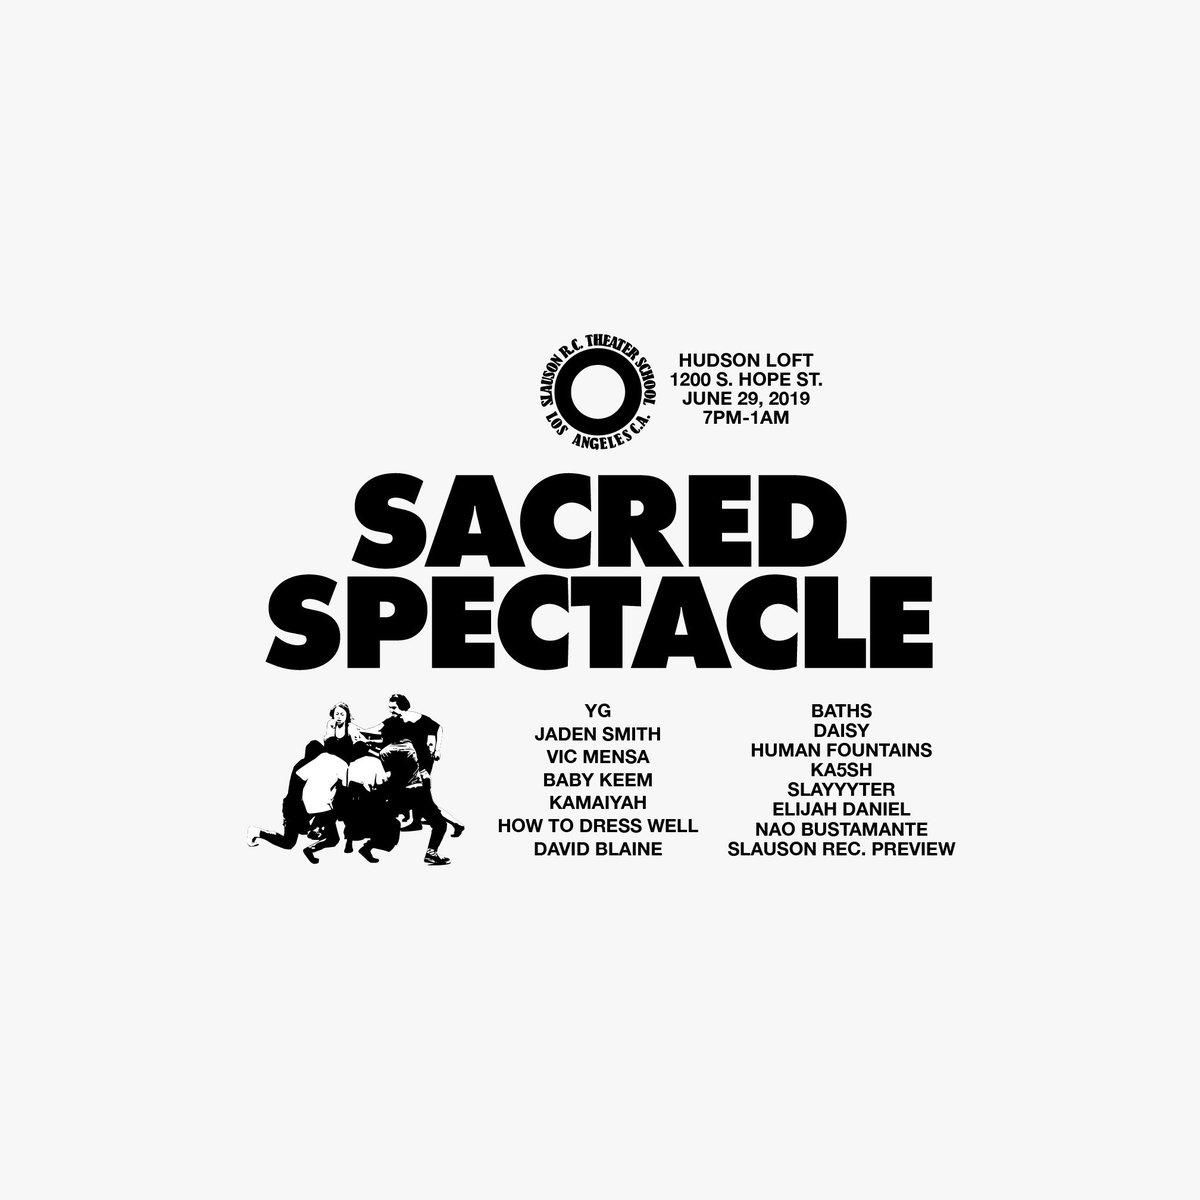 June 29, 2019 7:00pm - 1:00am sacredspectacle.eventbrite.com